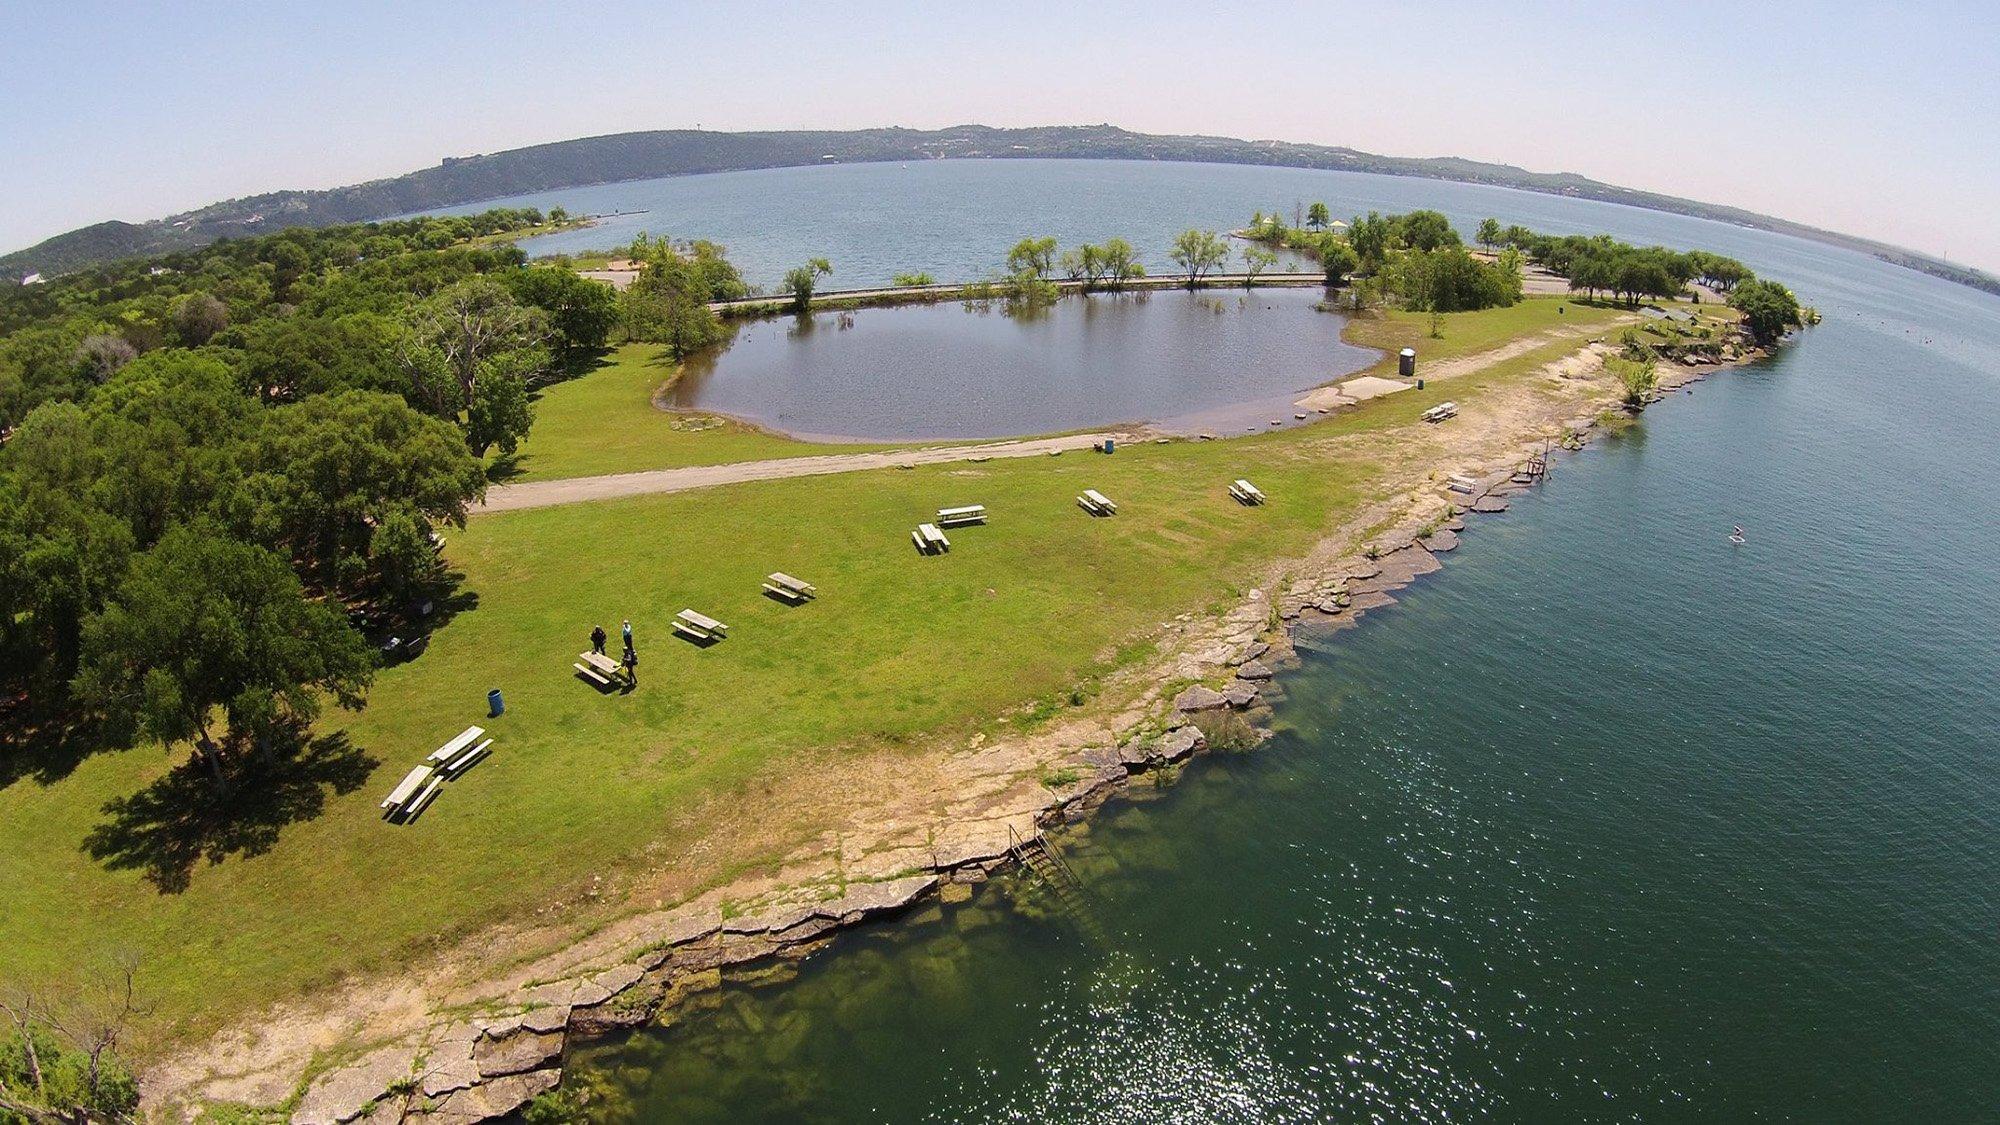 Windy Point Park - Lake Travis